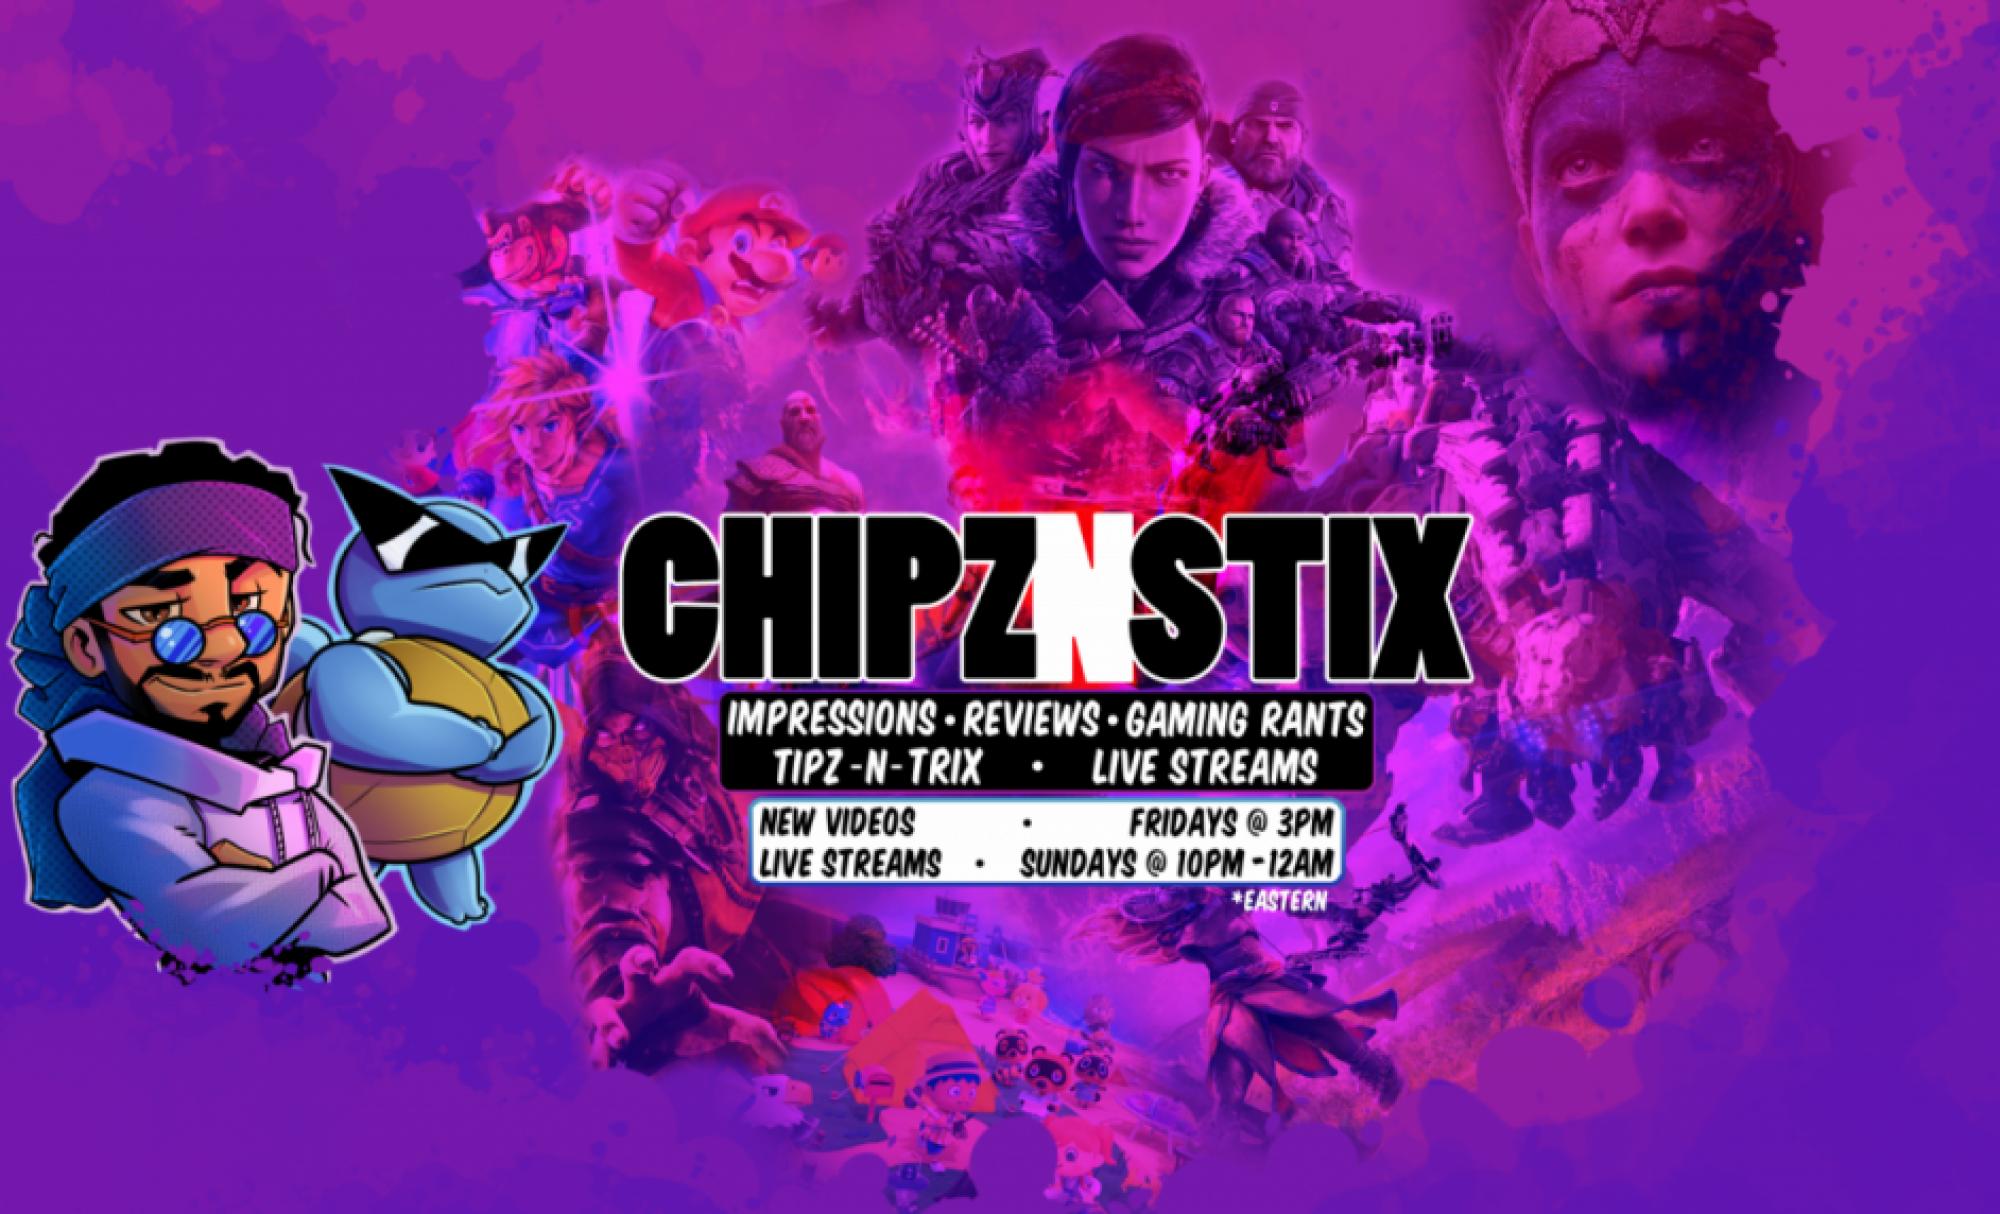 Chipz-N-Stix